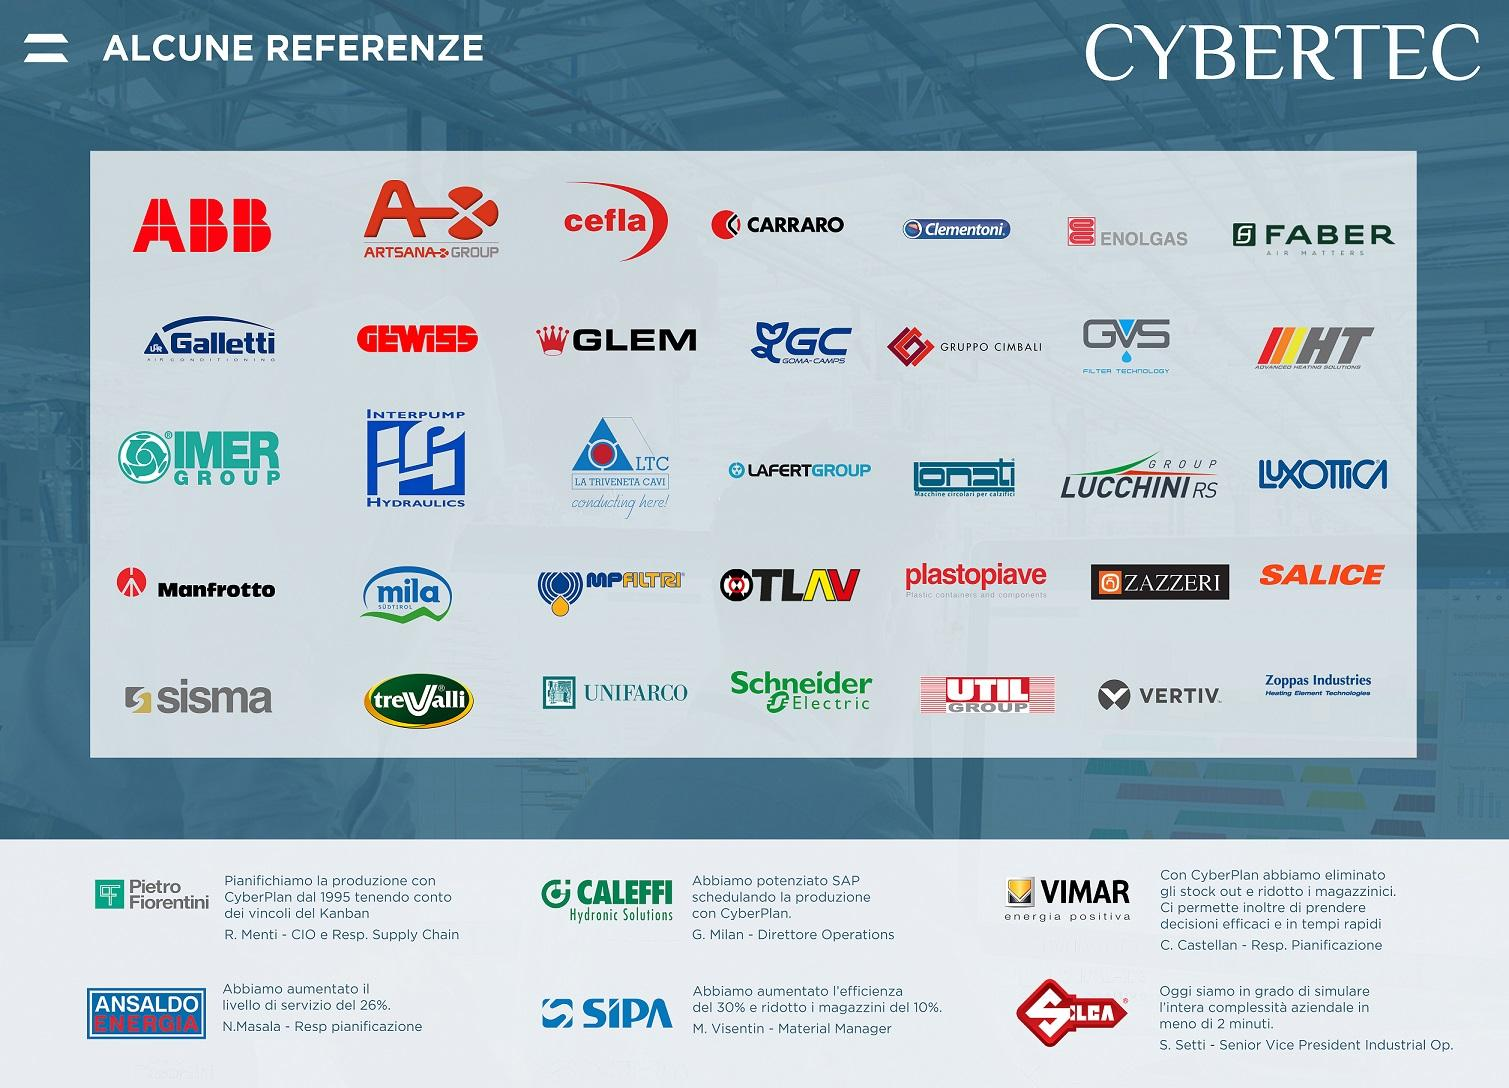 Cybertec Customers